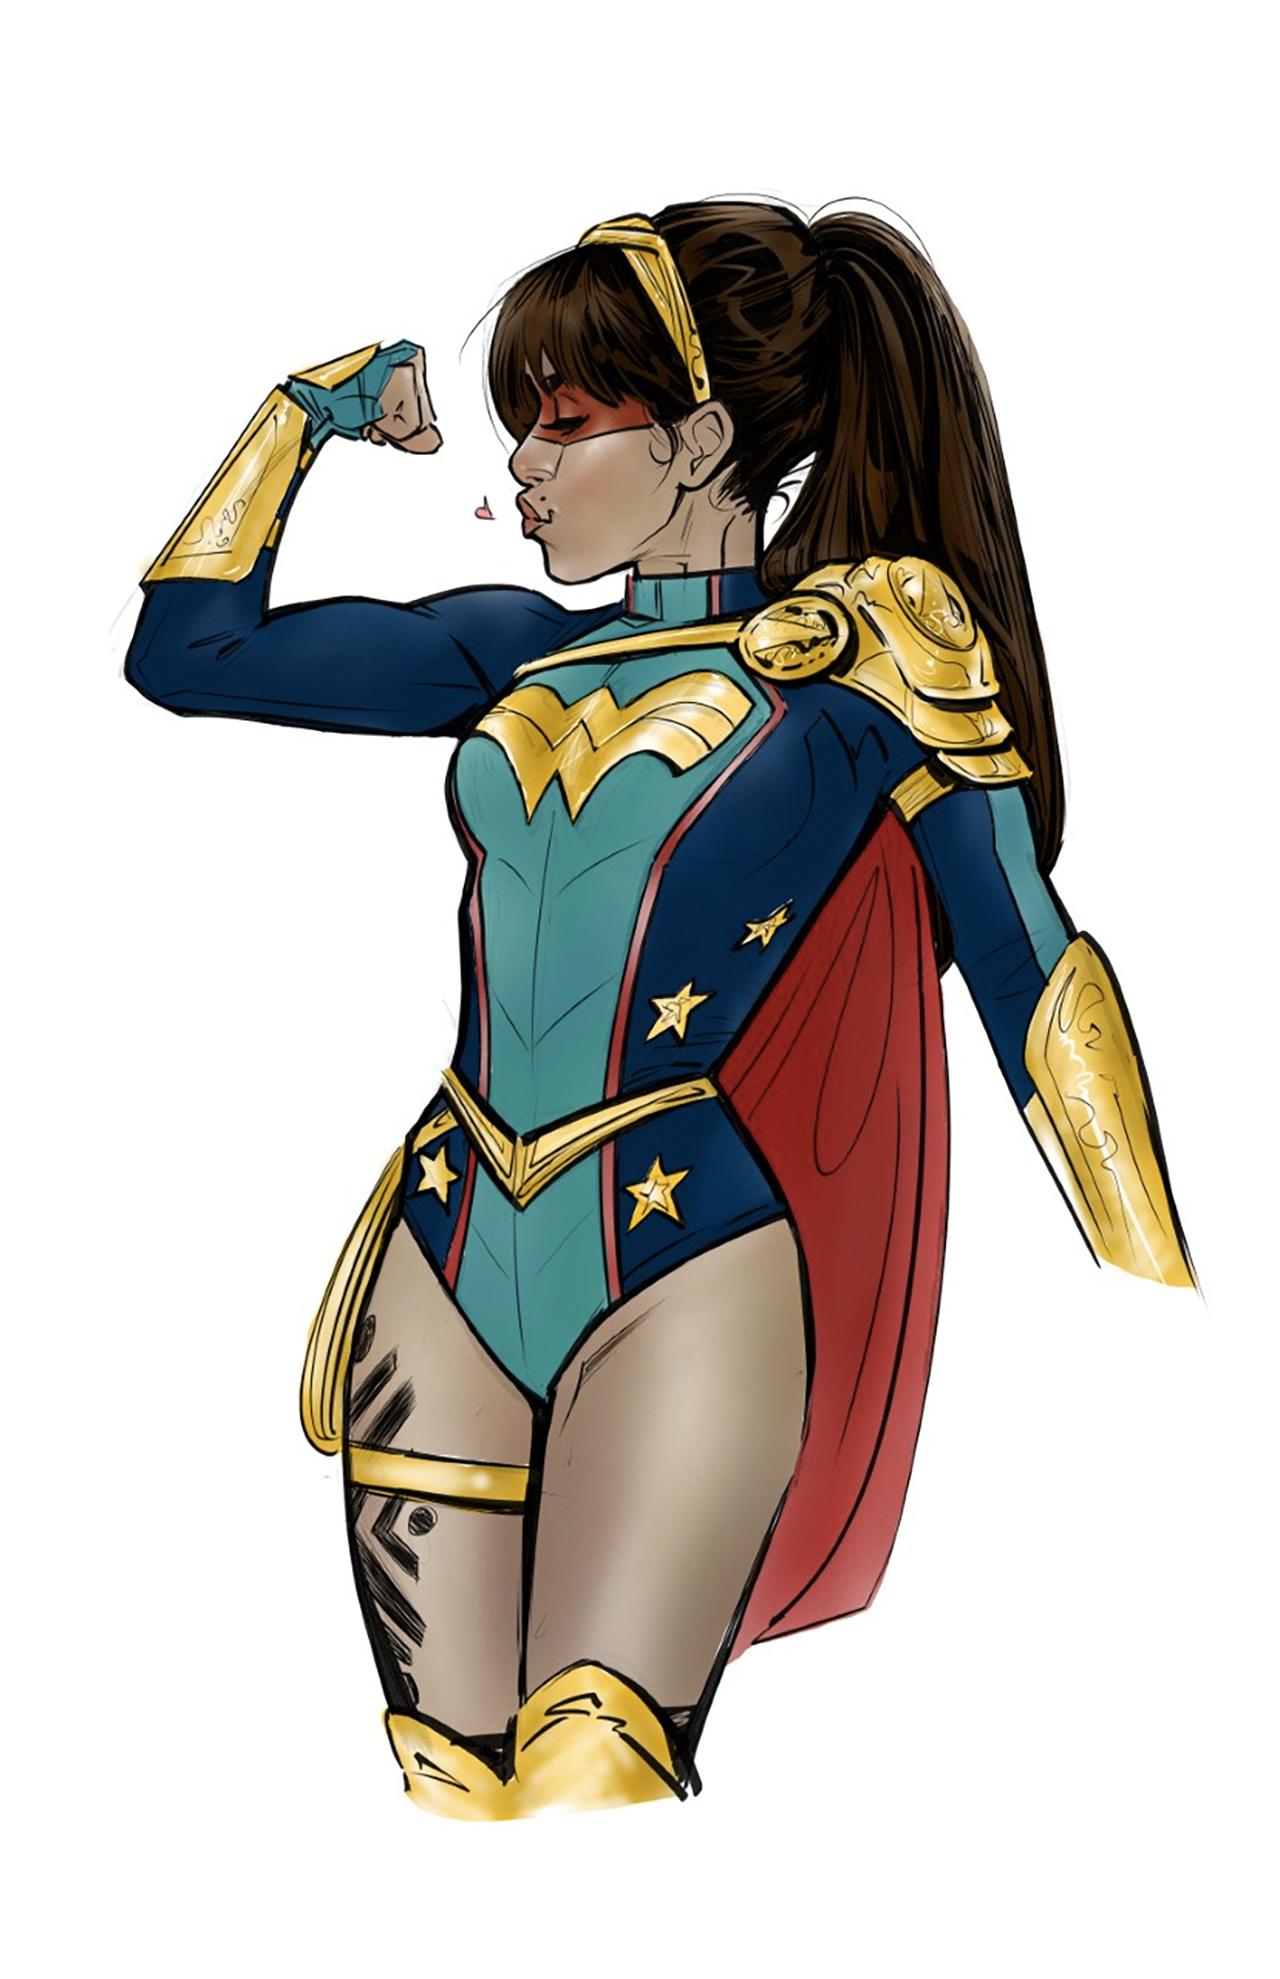 Dc Future State Wonder Woman Gets Her Own Title As Wonder Girl Gamesradar